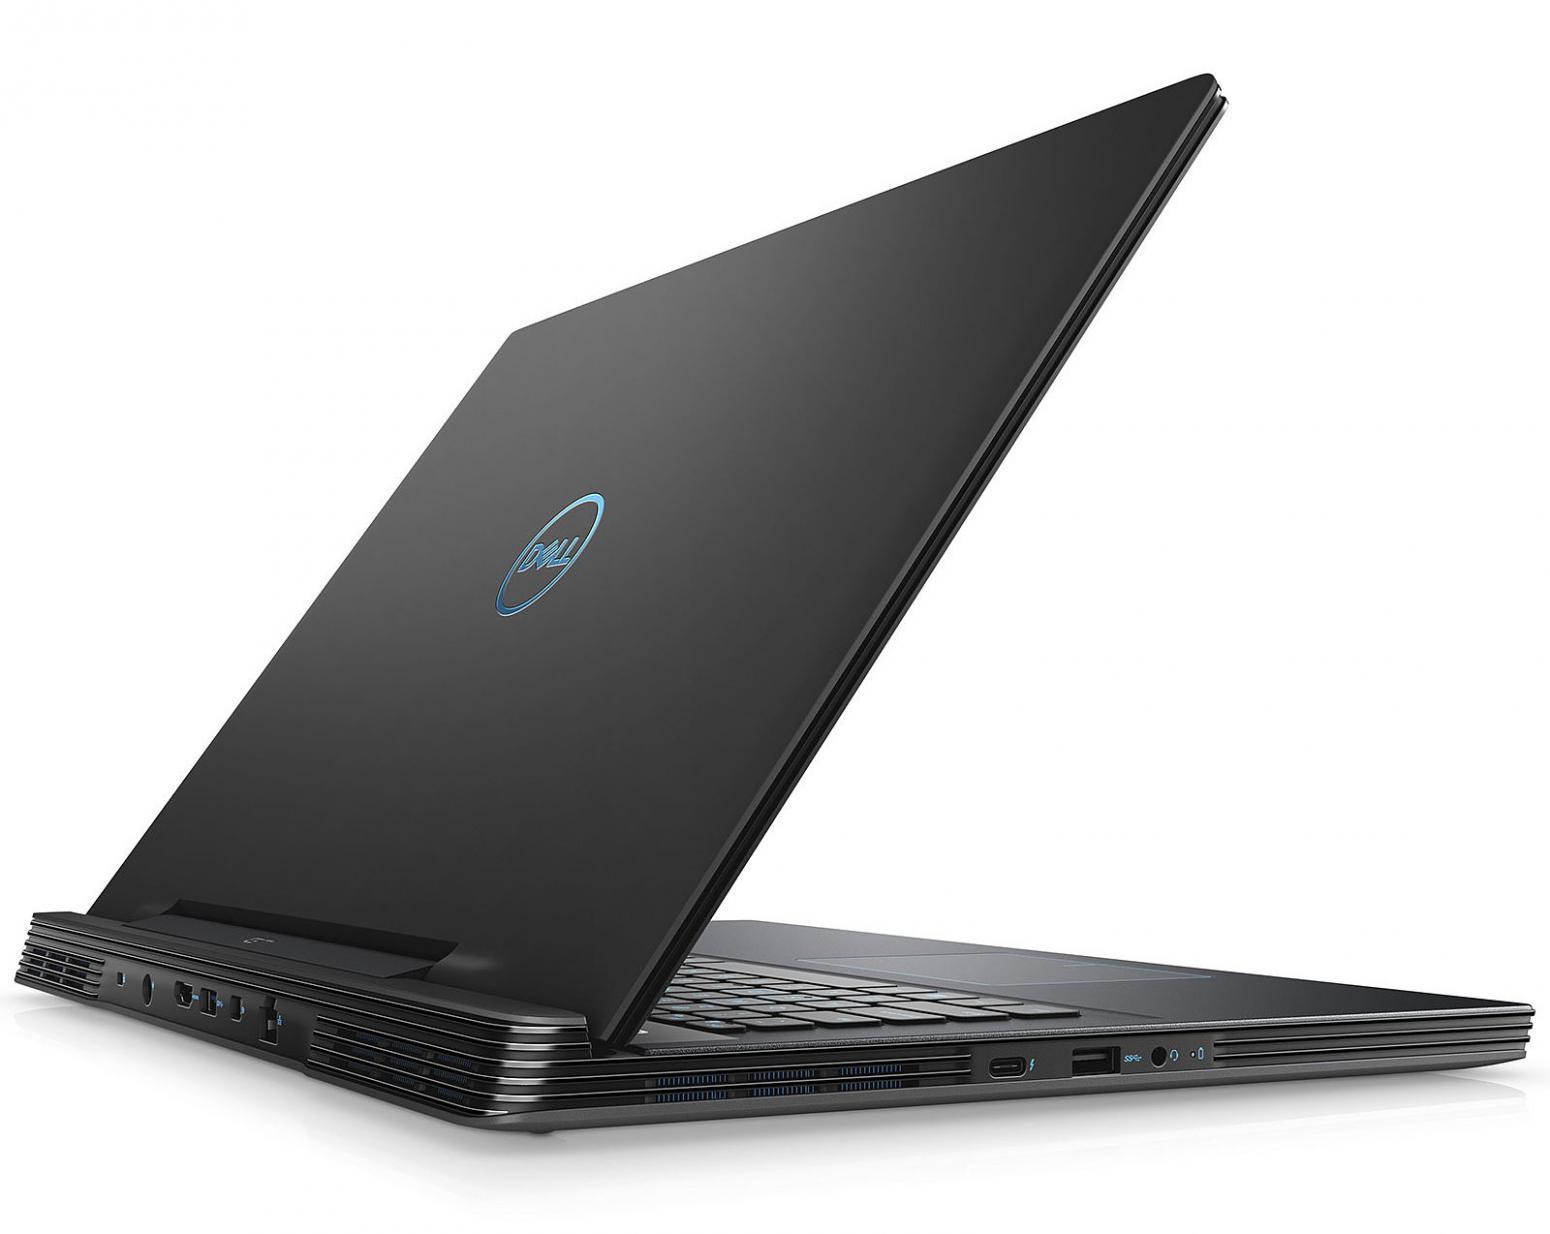 Ordinateur portable Dell G7 17 7790 (29D8X) Noir - RTX 2060, Hexa Core i7 - photo 4